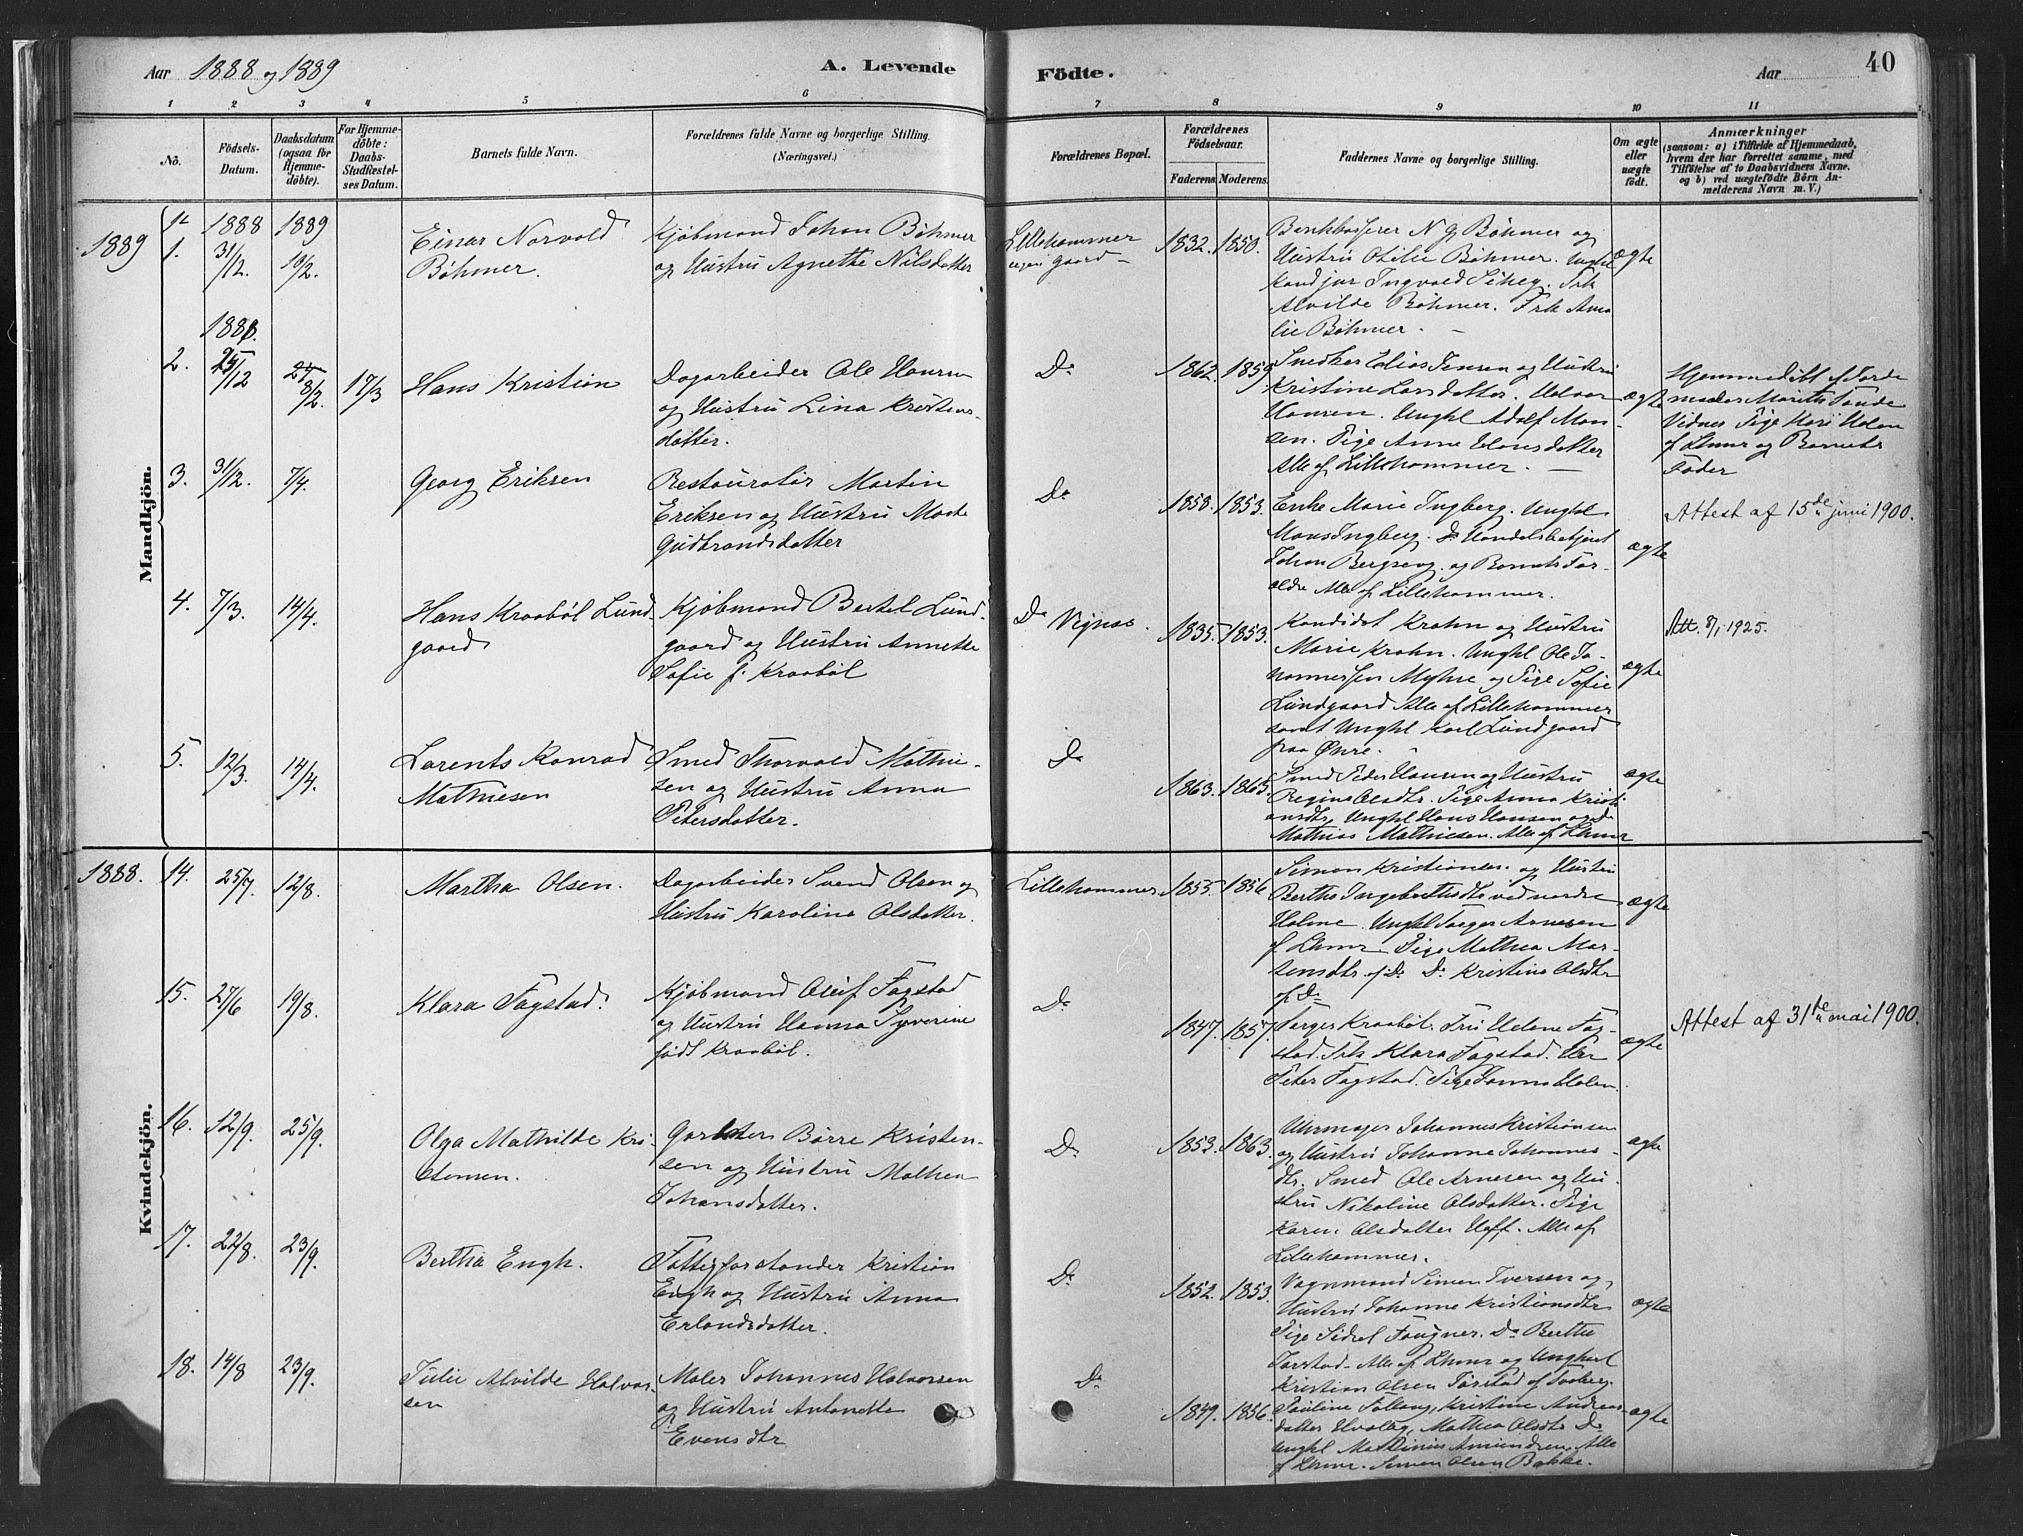 SAH, Fåberg prestekontor, Ministerialbok nr. 10, 1879-1900, s. 40